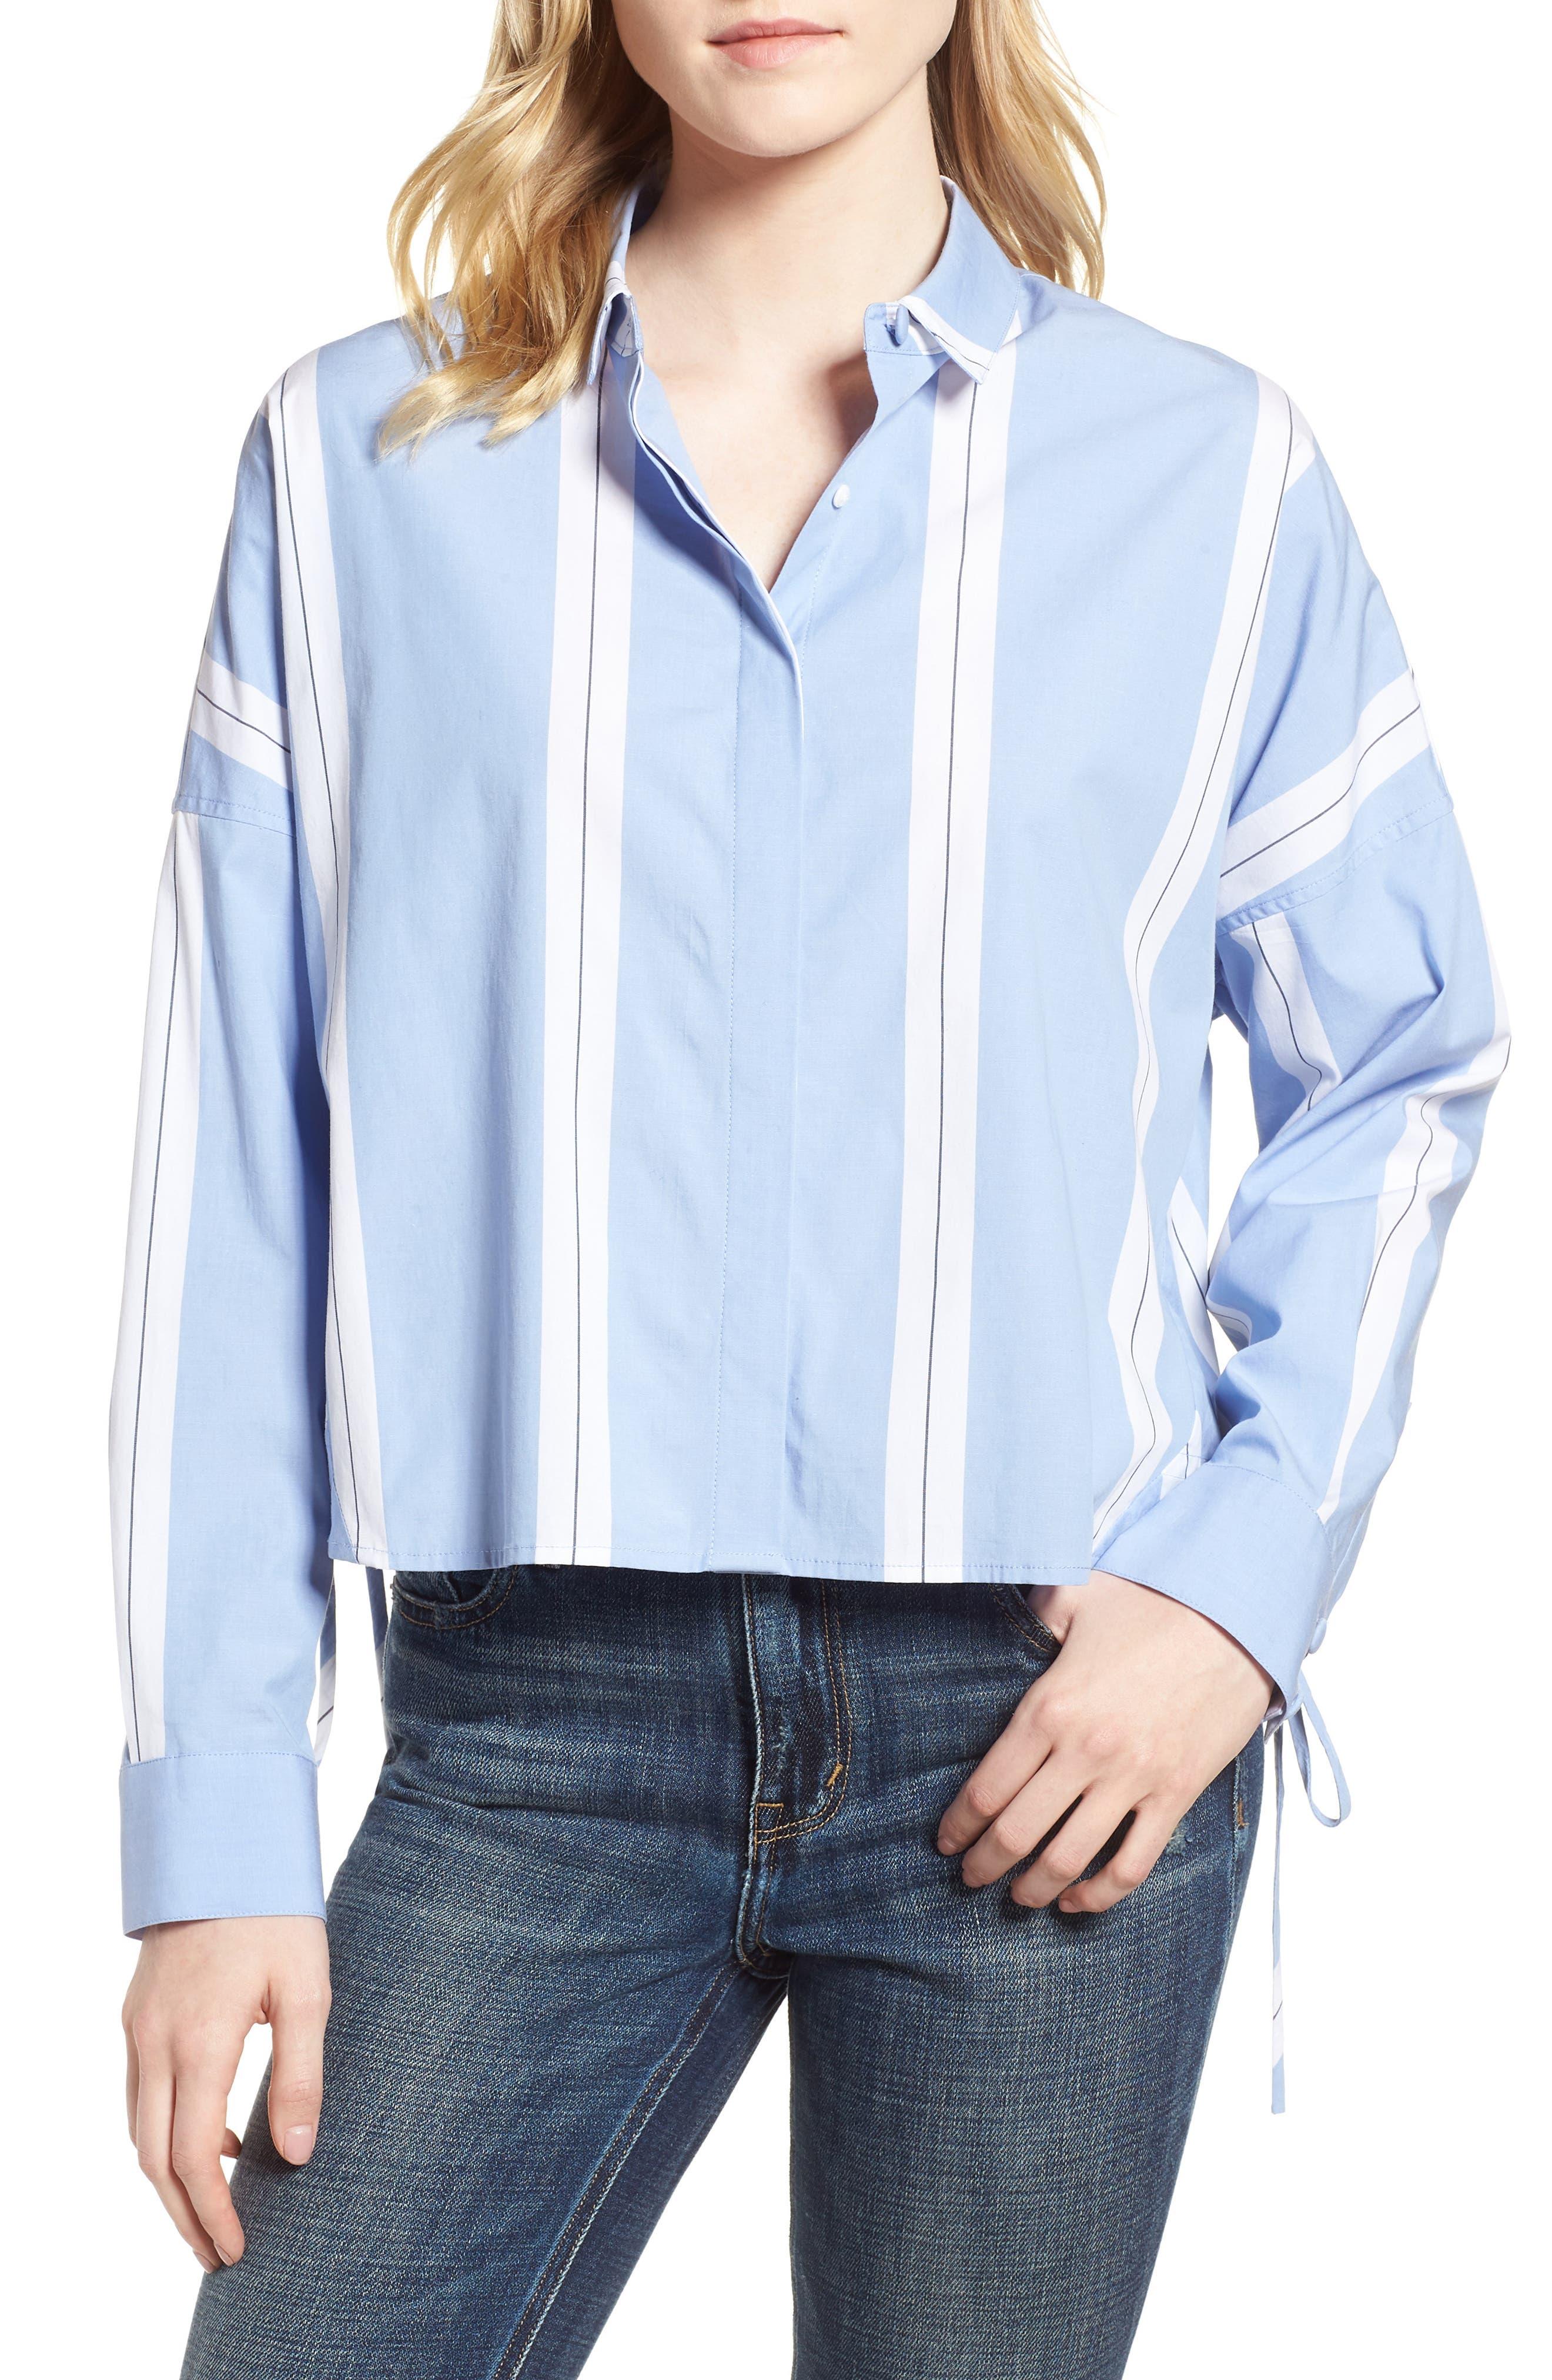 Adele Blouson Top,                         Main,                         color, Bright White/ Cornflower Blue